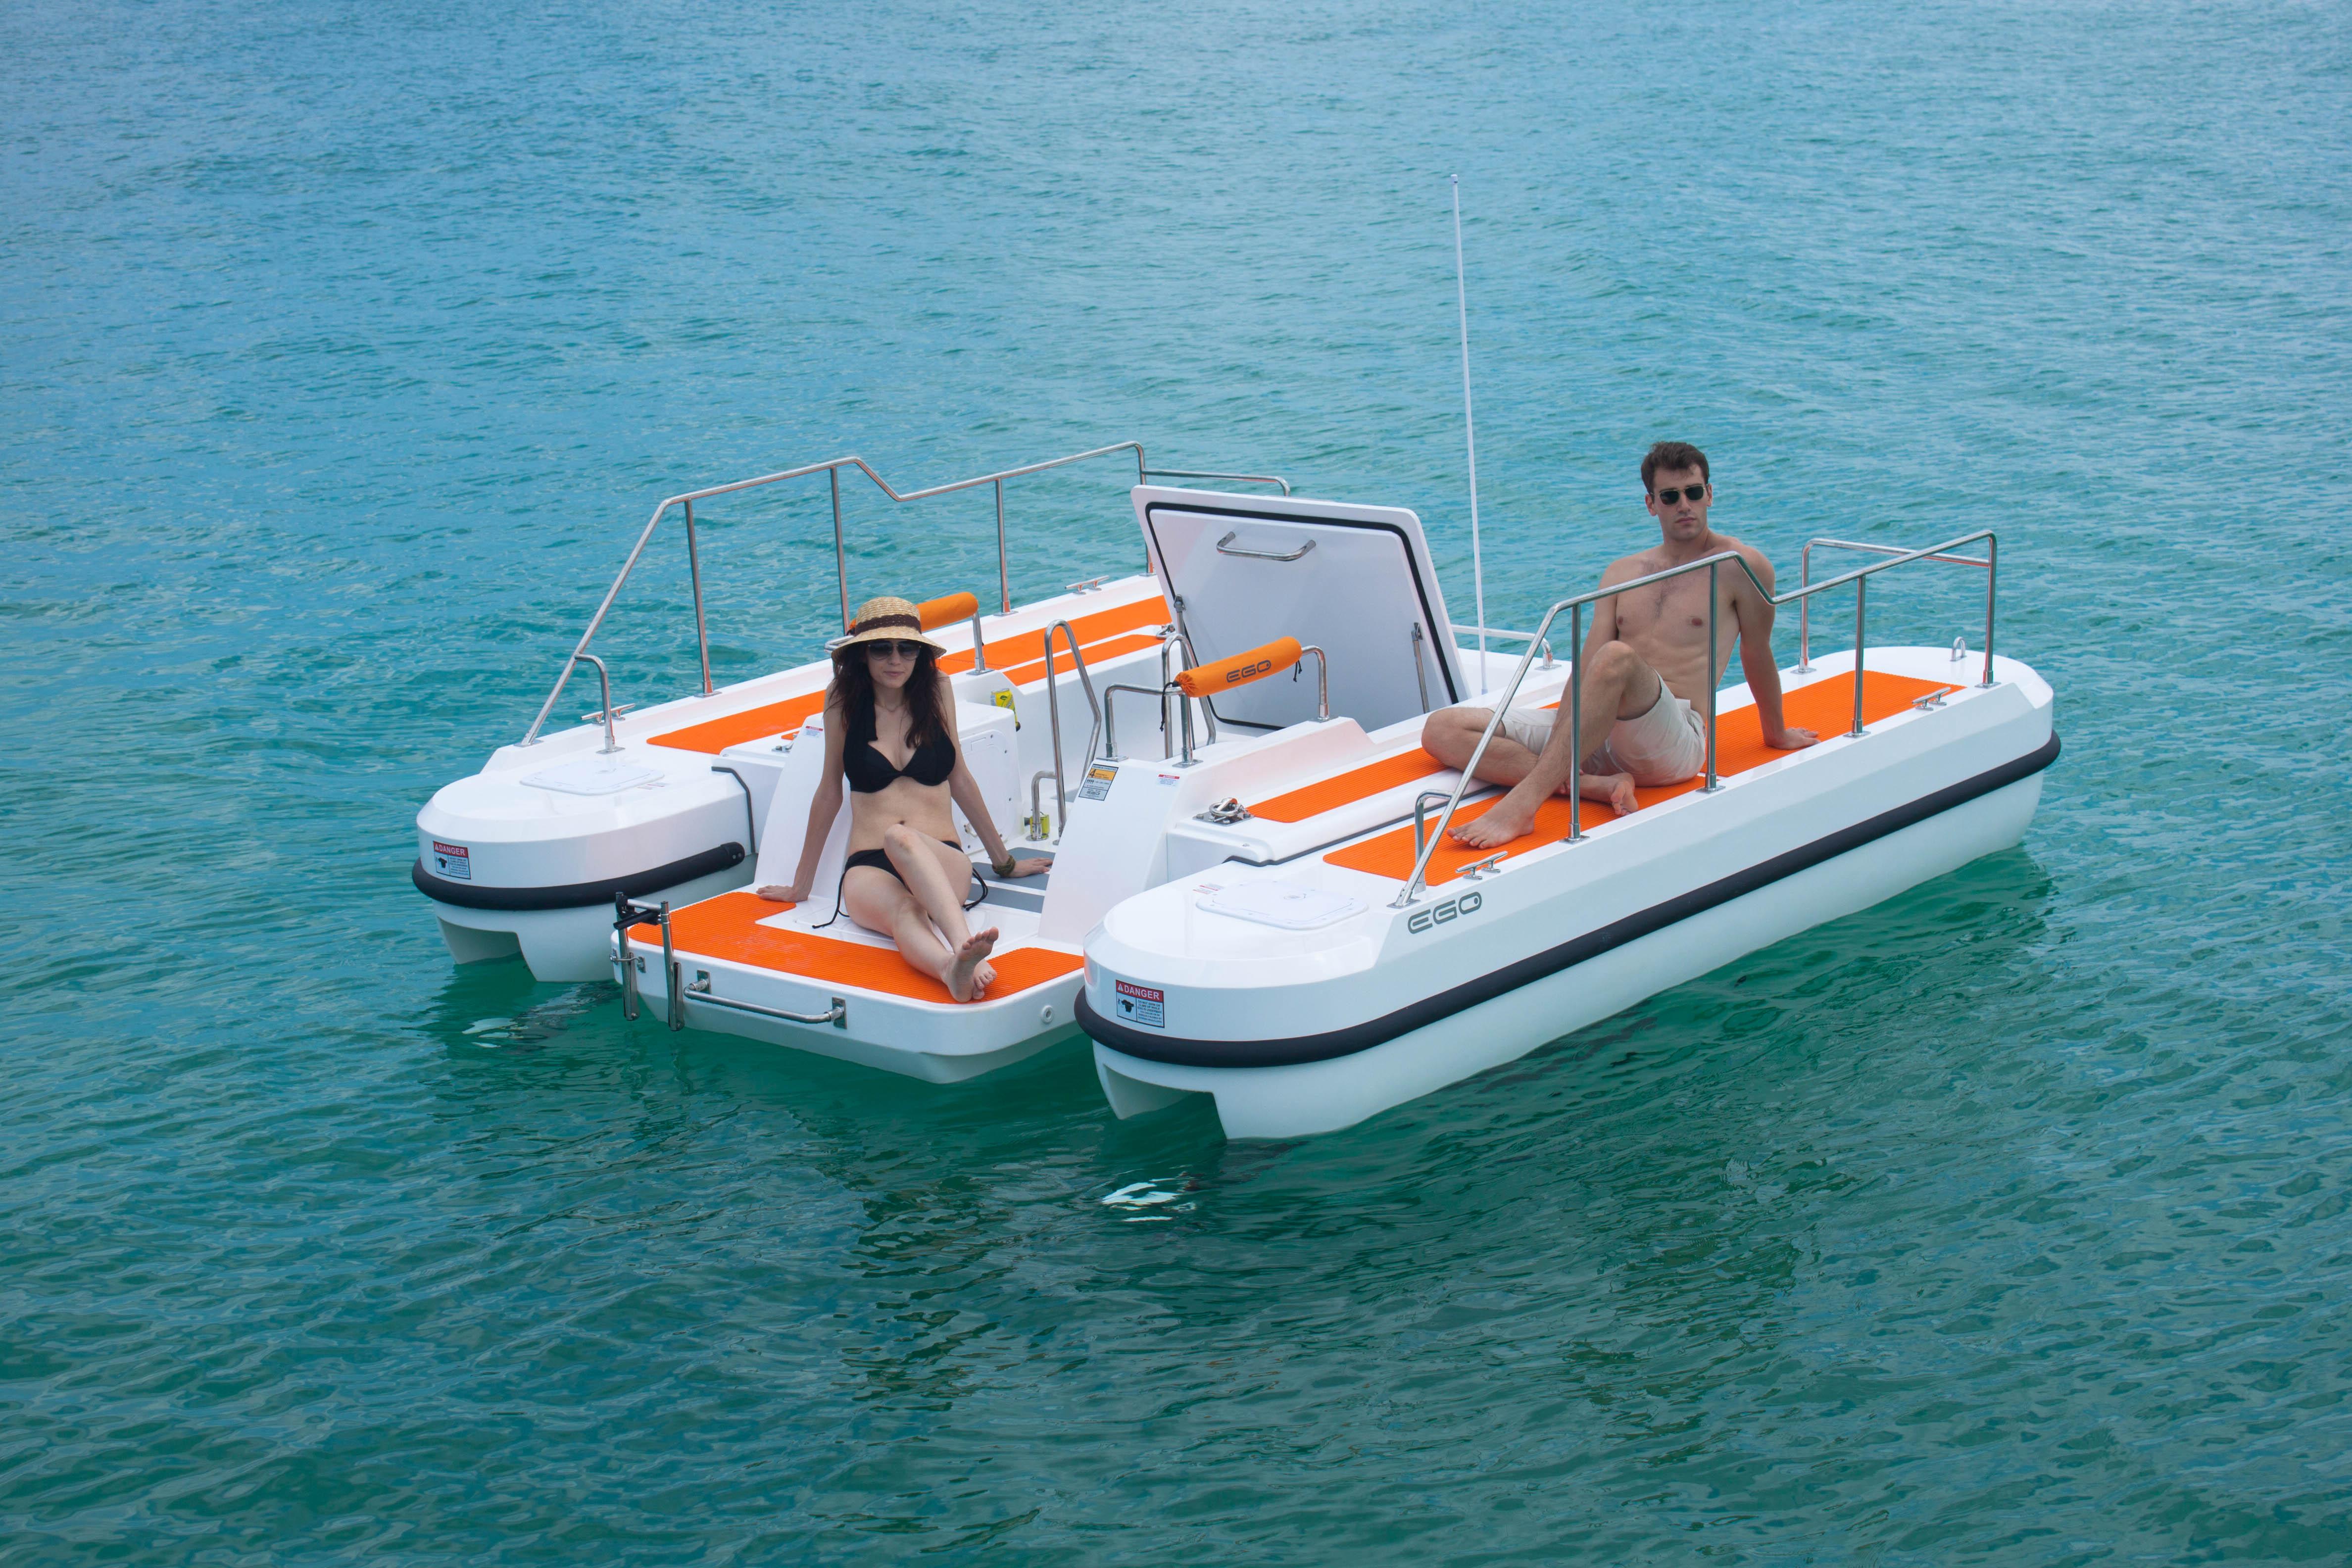 Racing Boating Multifunction display InkDisplay 6-inch,Shockproof Waterproof Screen with Mounting Bracket for Sailing